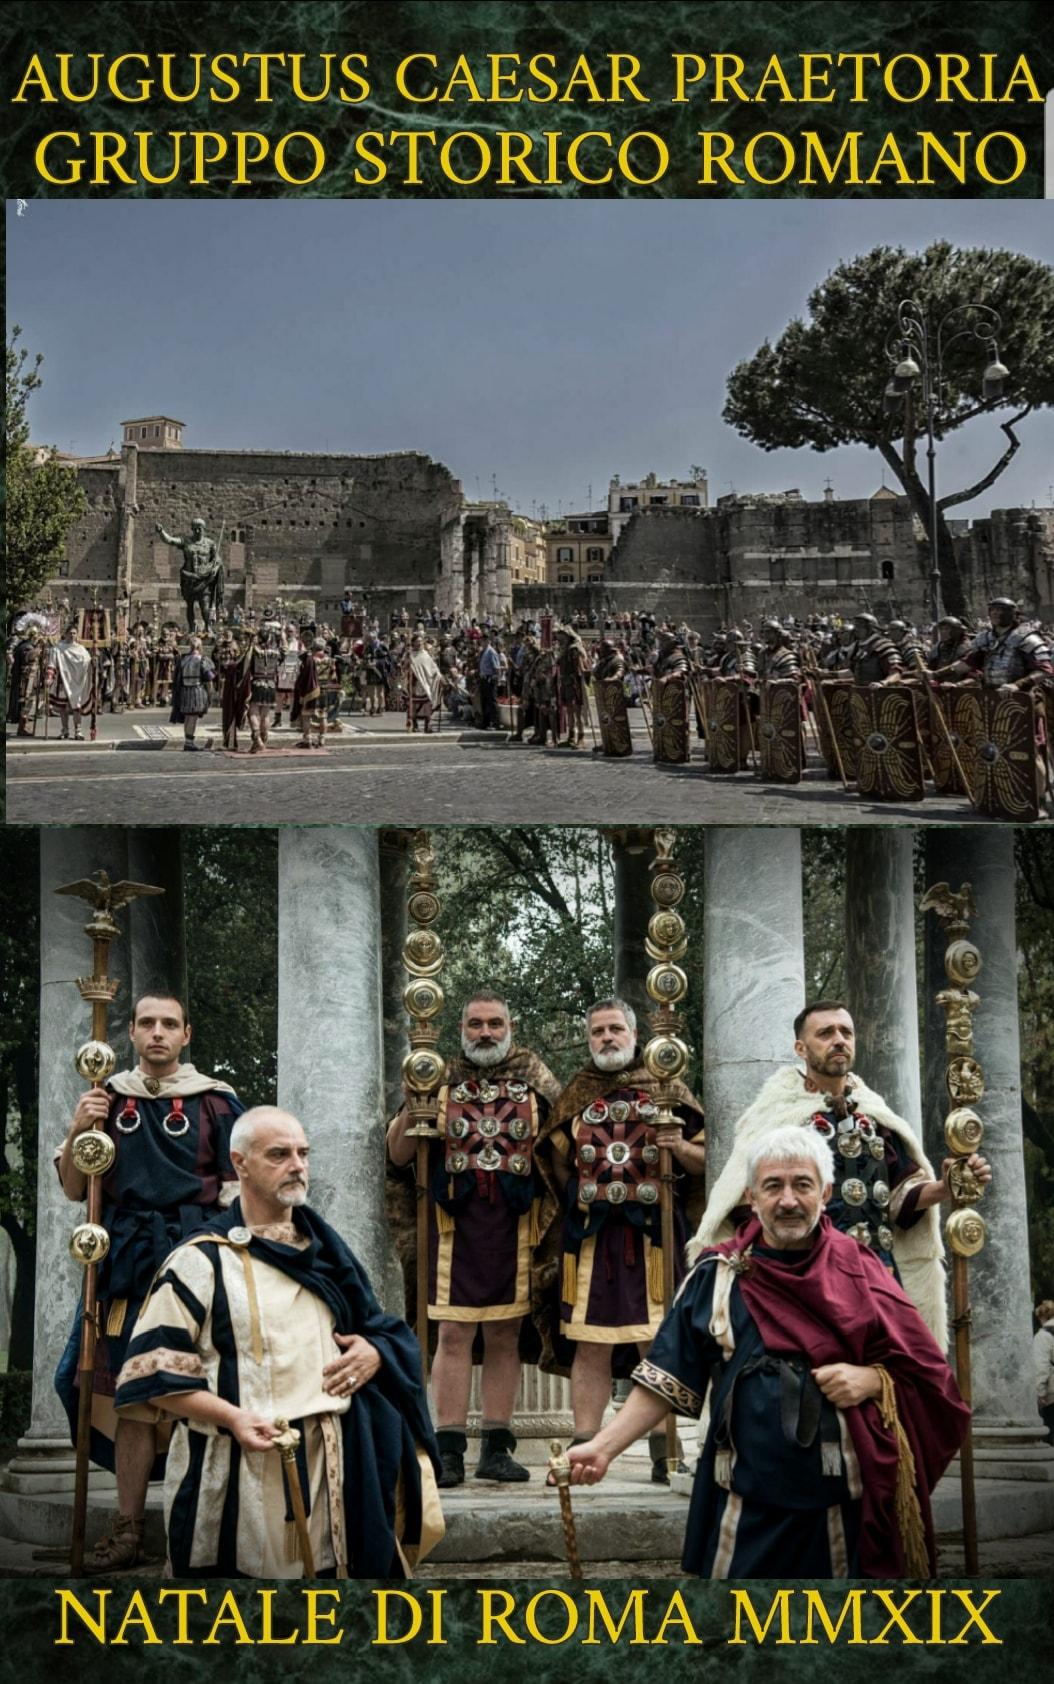 Programme de natale di Roma 2019